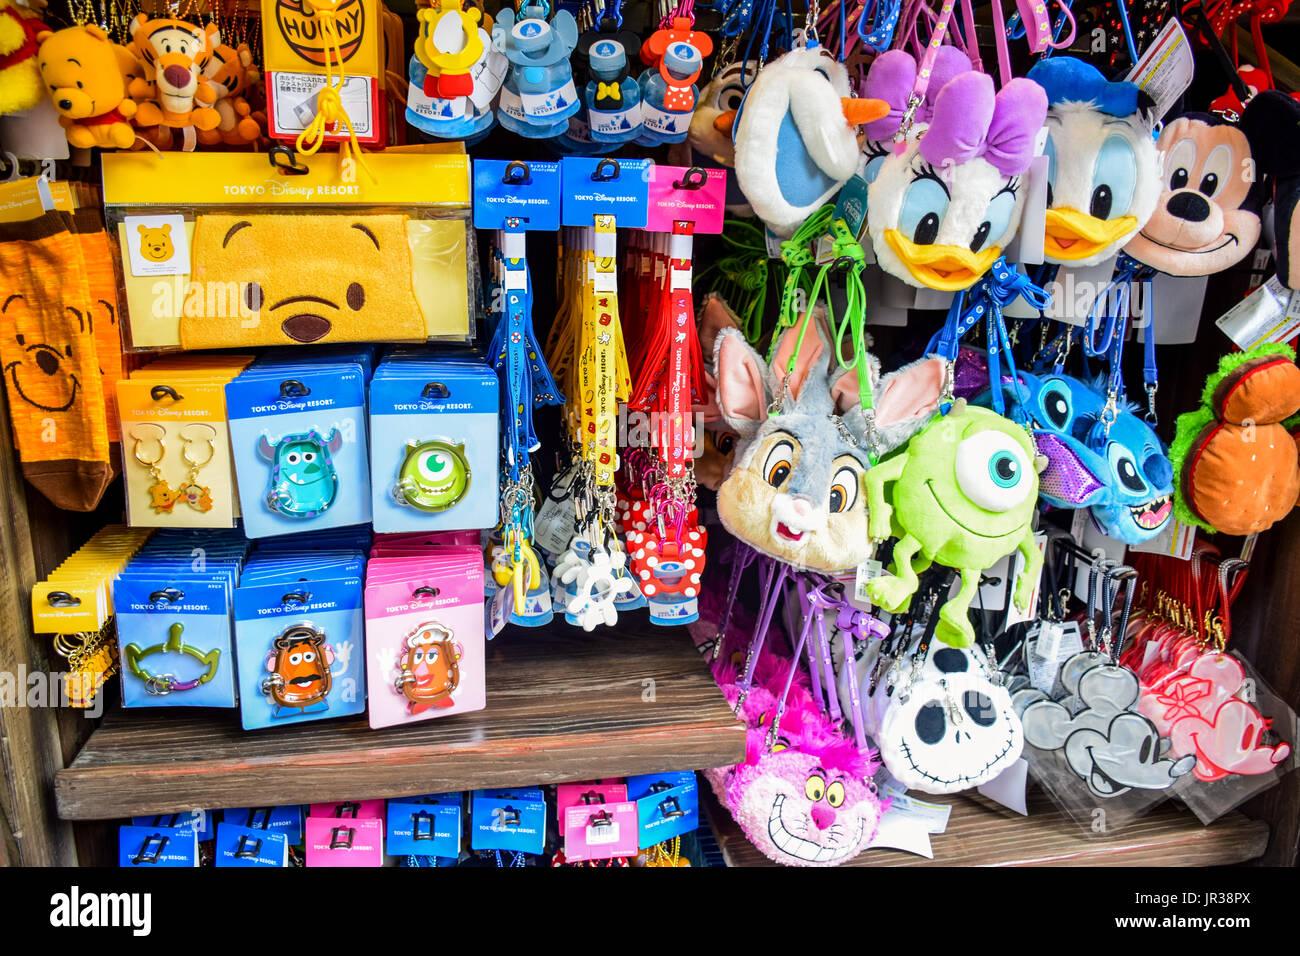 Image result for tokyo disney merchandise